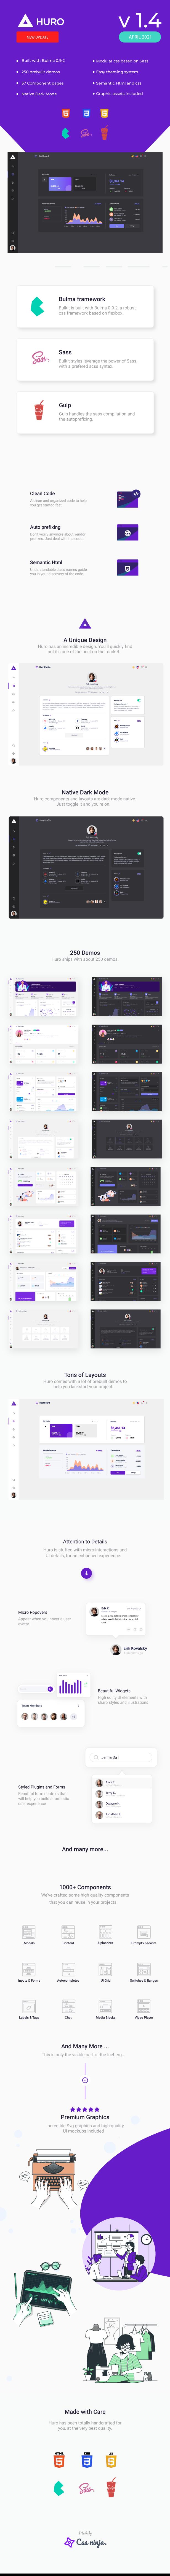 huro infographics 1.4 - Huro - Multipurpose Admin and Webapp UI Kit